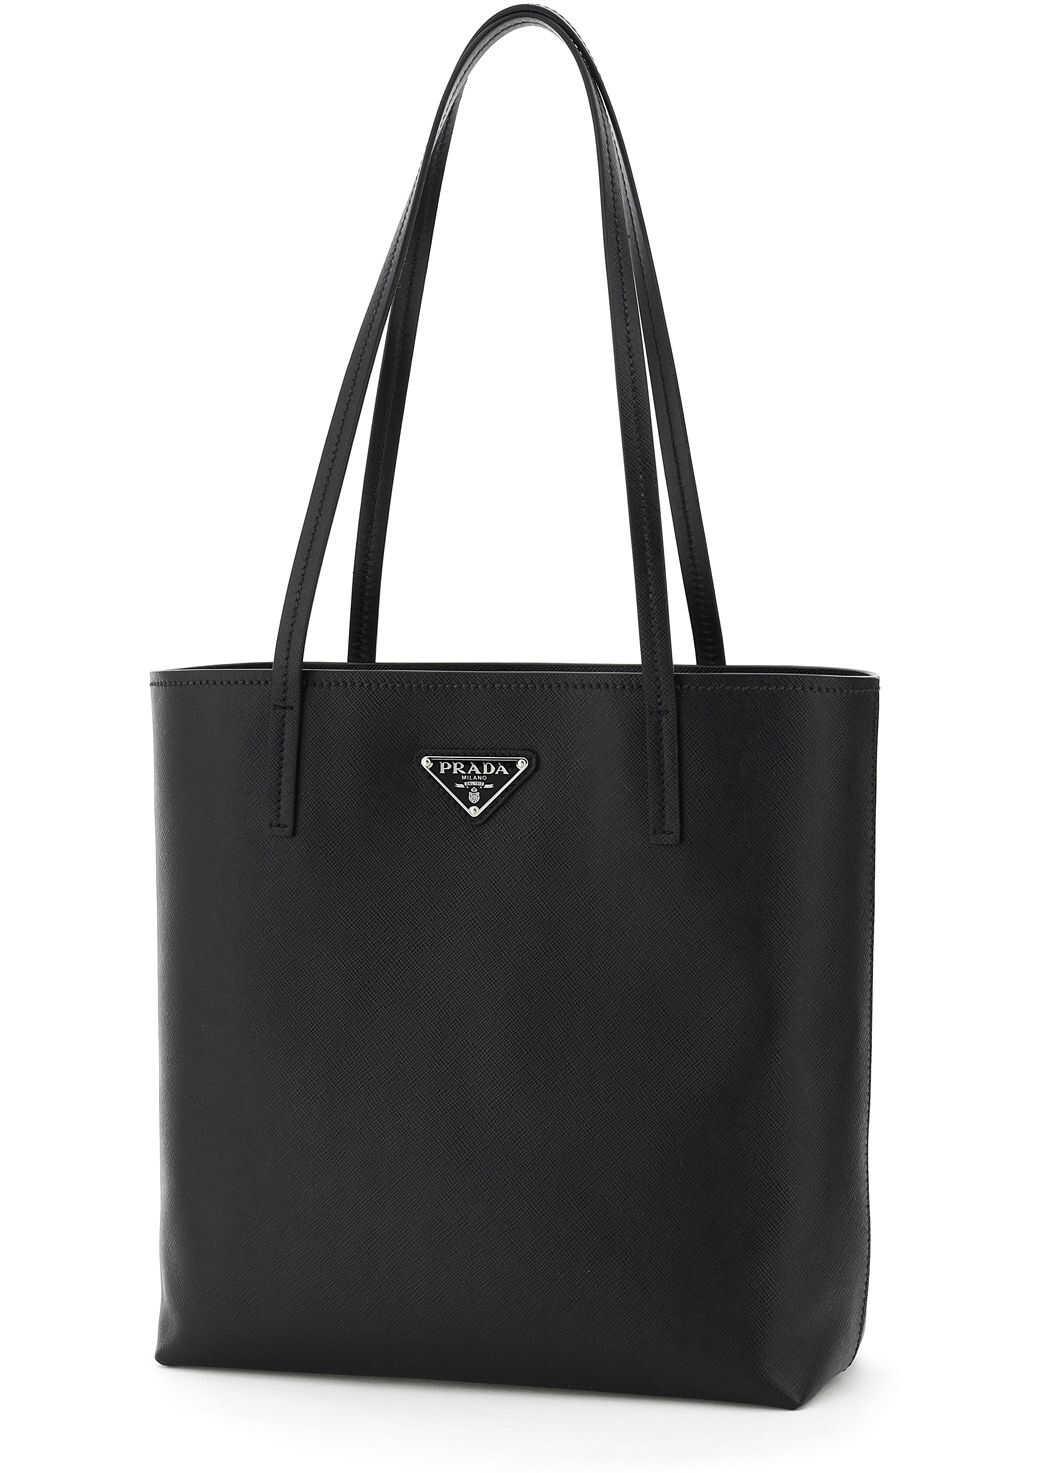 Prada Saffiano Small Tote Bag 1BG342 V OOM 053 NERO imagine b-mall.ro